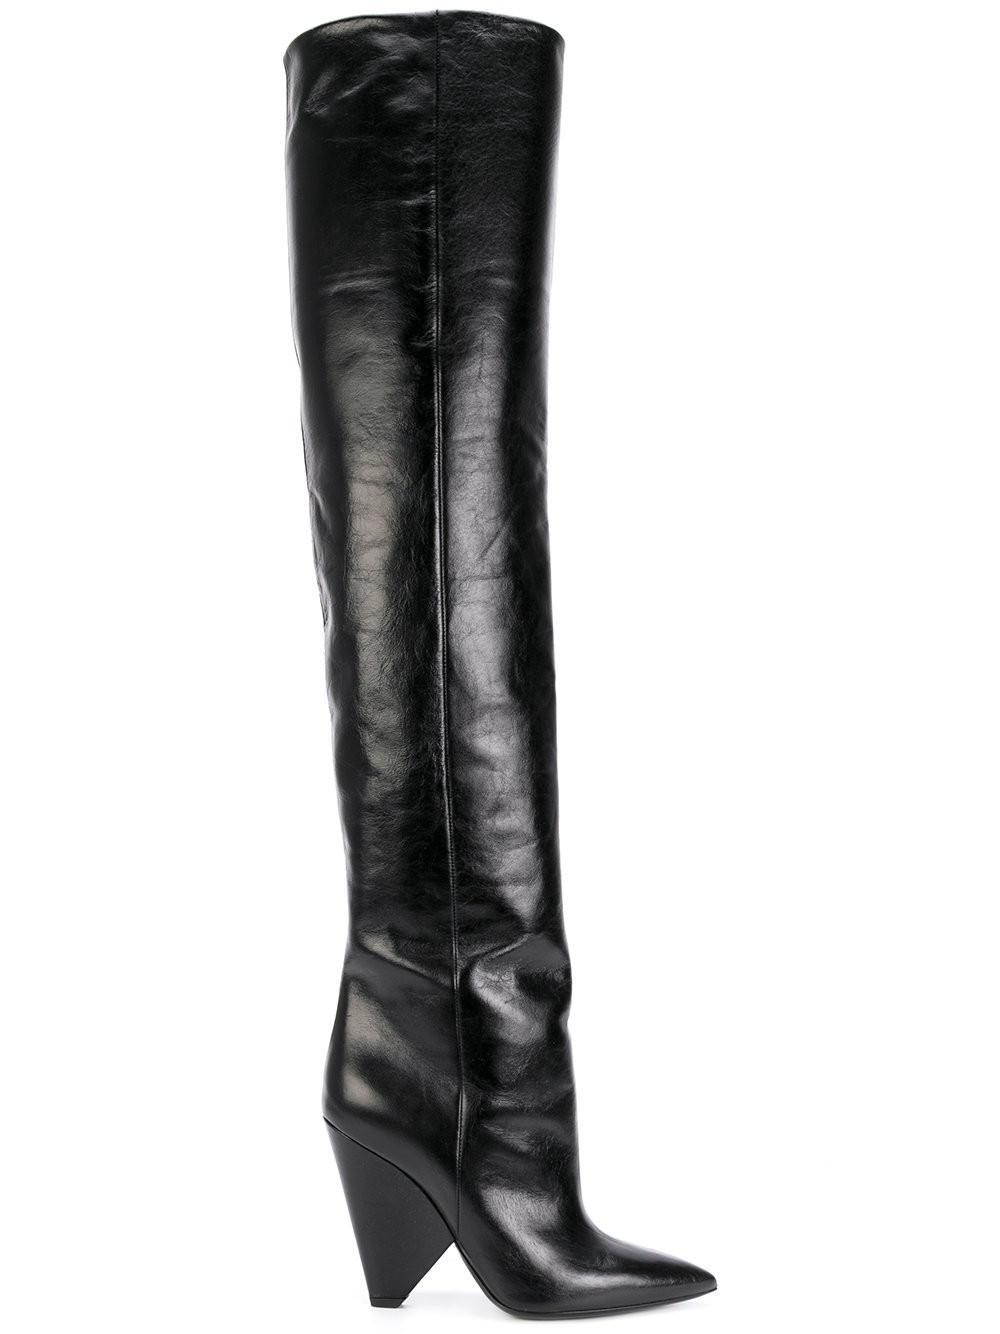 Niki Glossed-leather Knee Boots - Black Saint Laurent Websites For Sale W3pSPh4